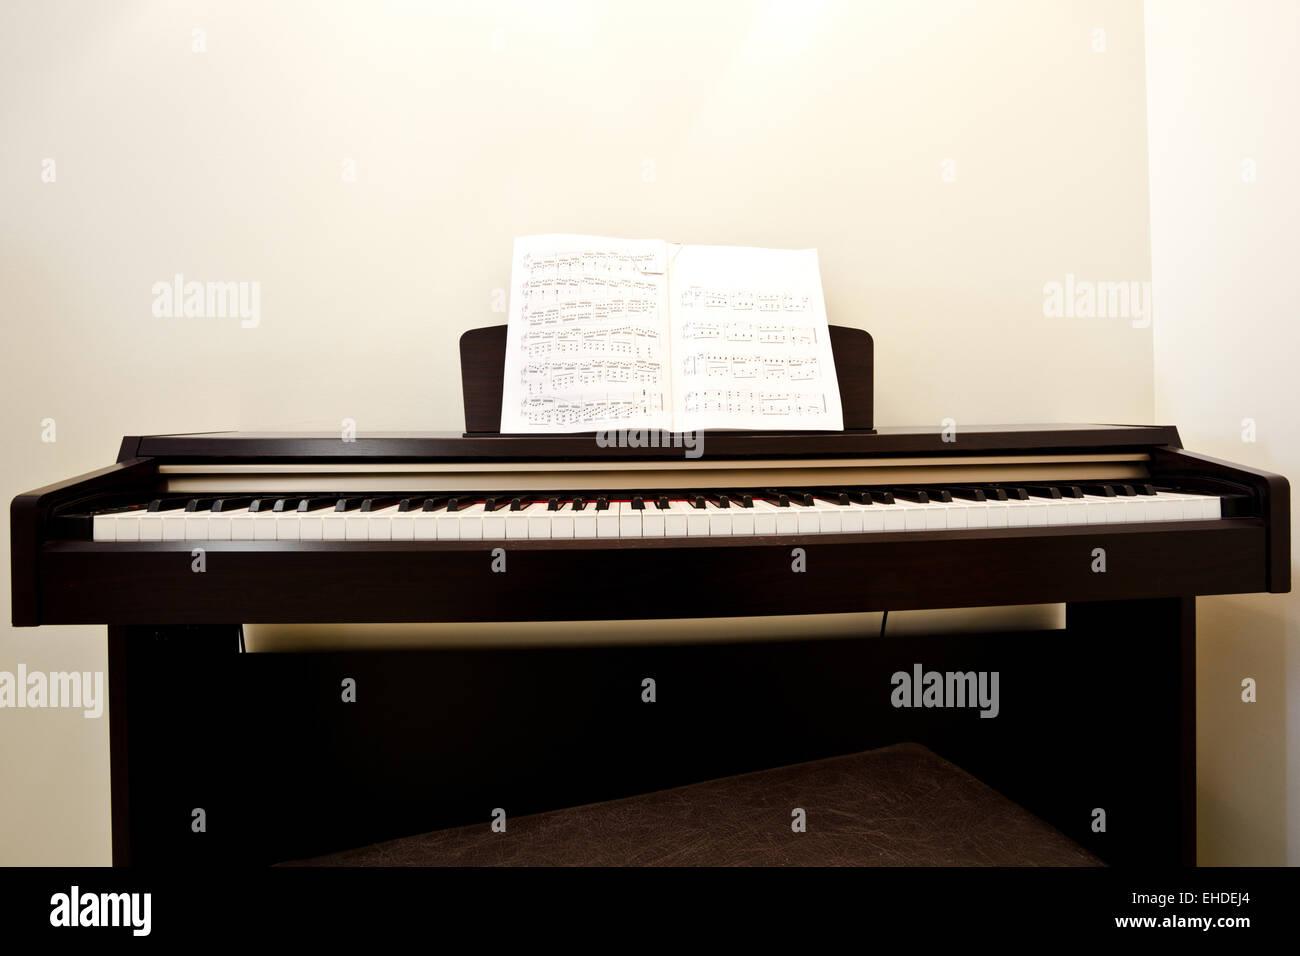 Piano in empty room - Stock Image